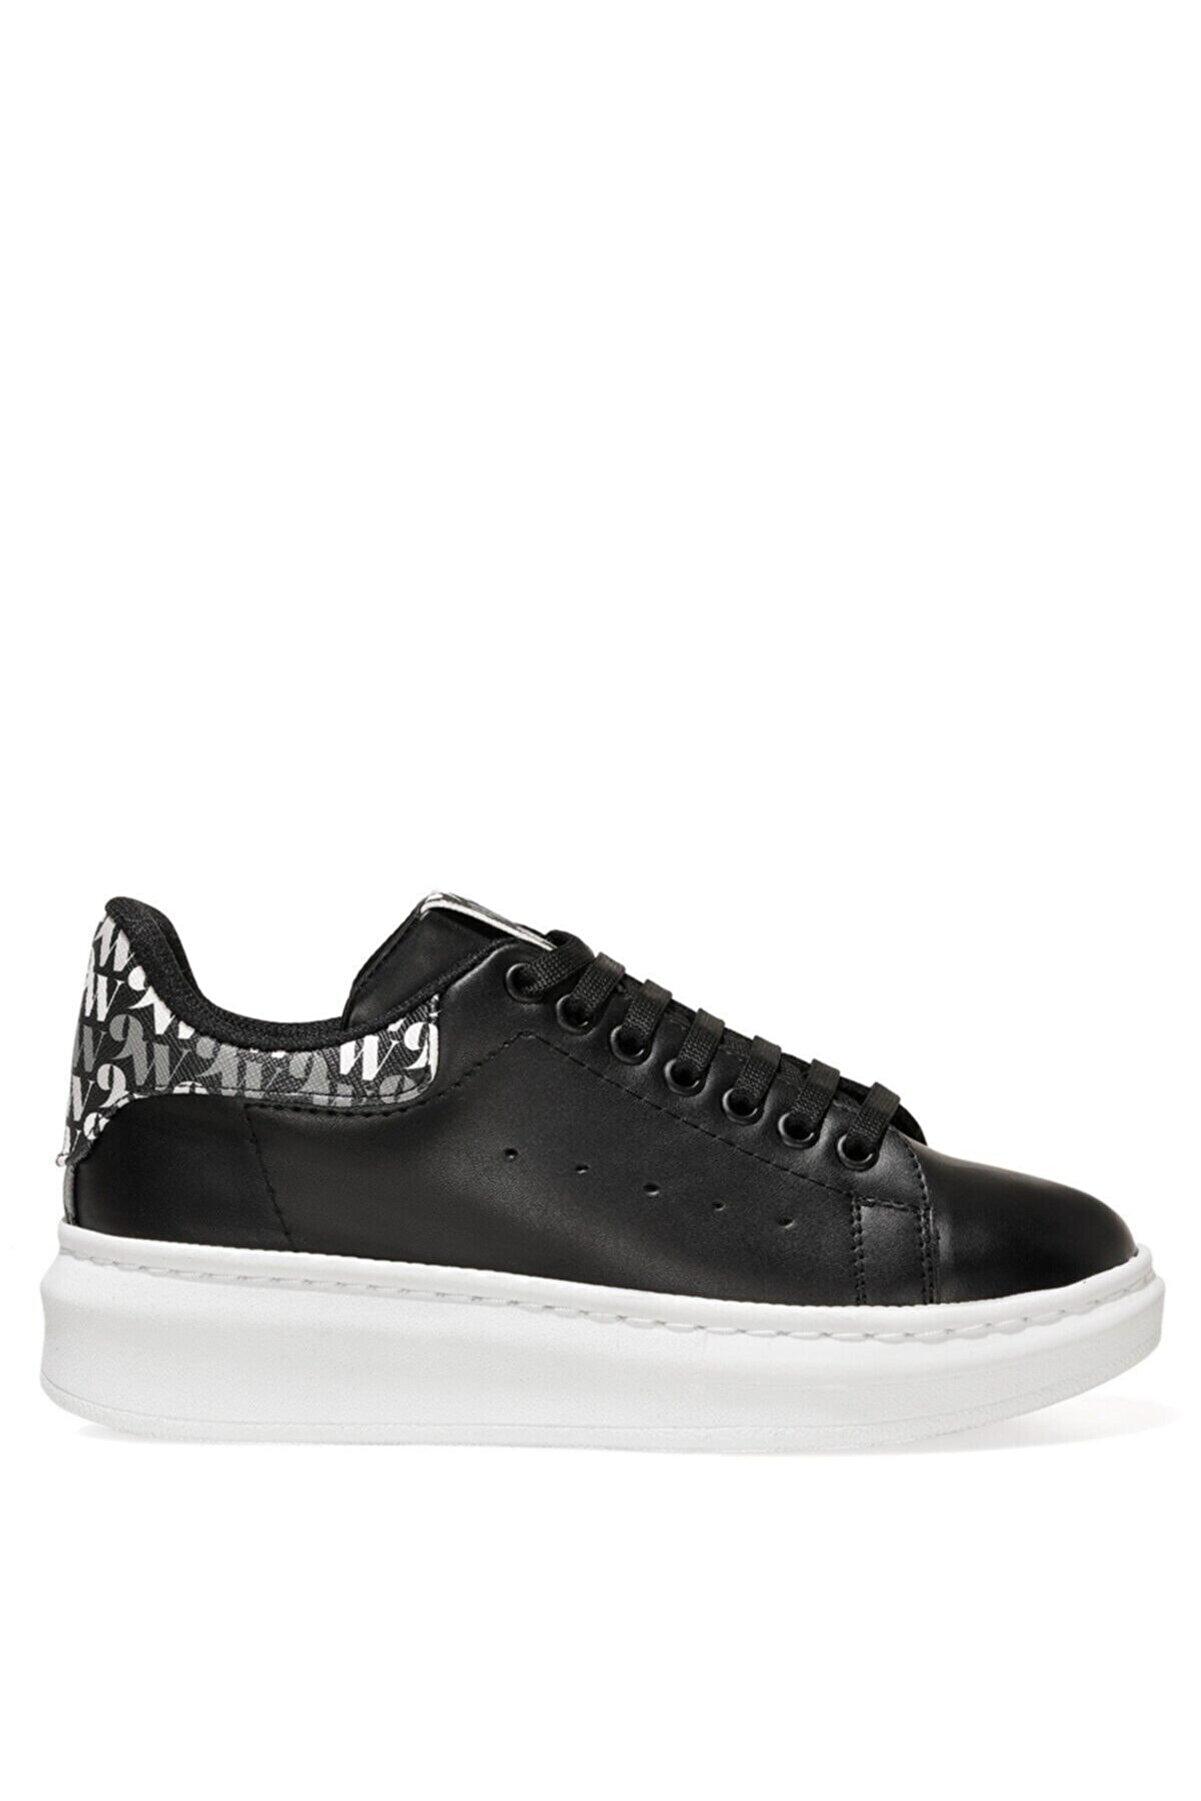 Nine West HERESA 1FX Siyah Kadın Fashion Sneaker 101006145